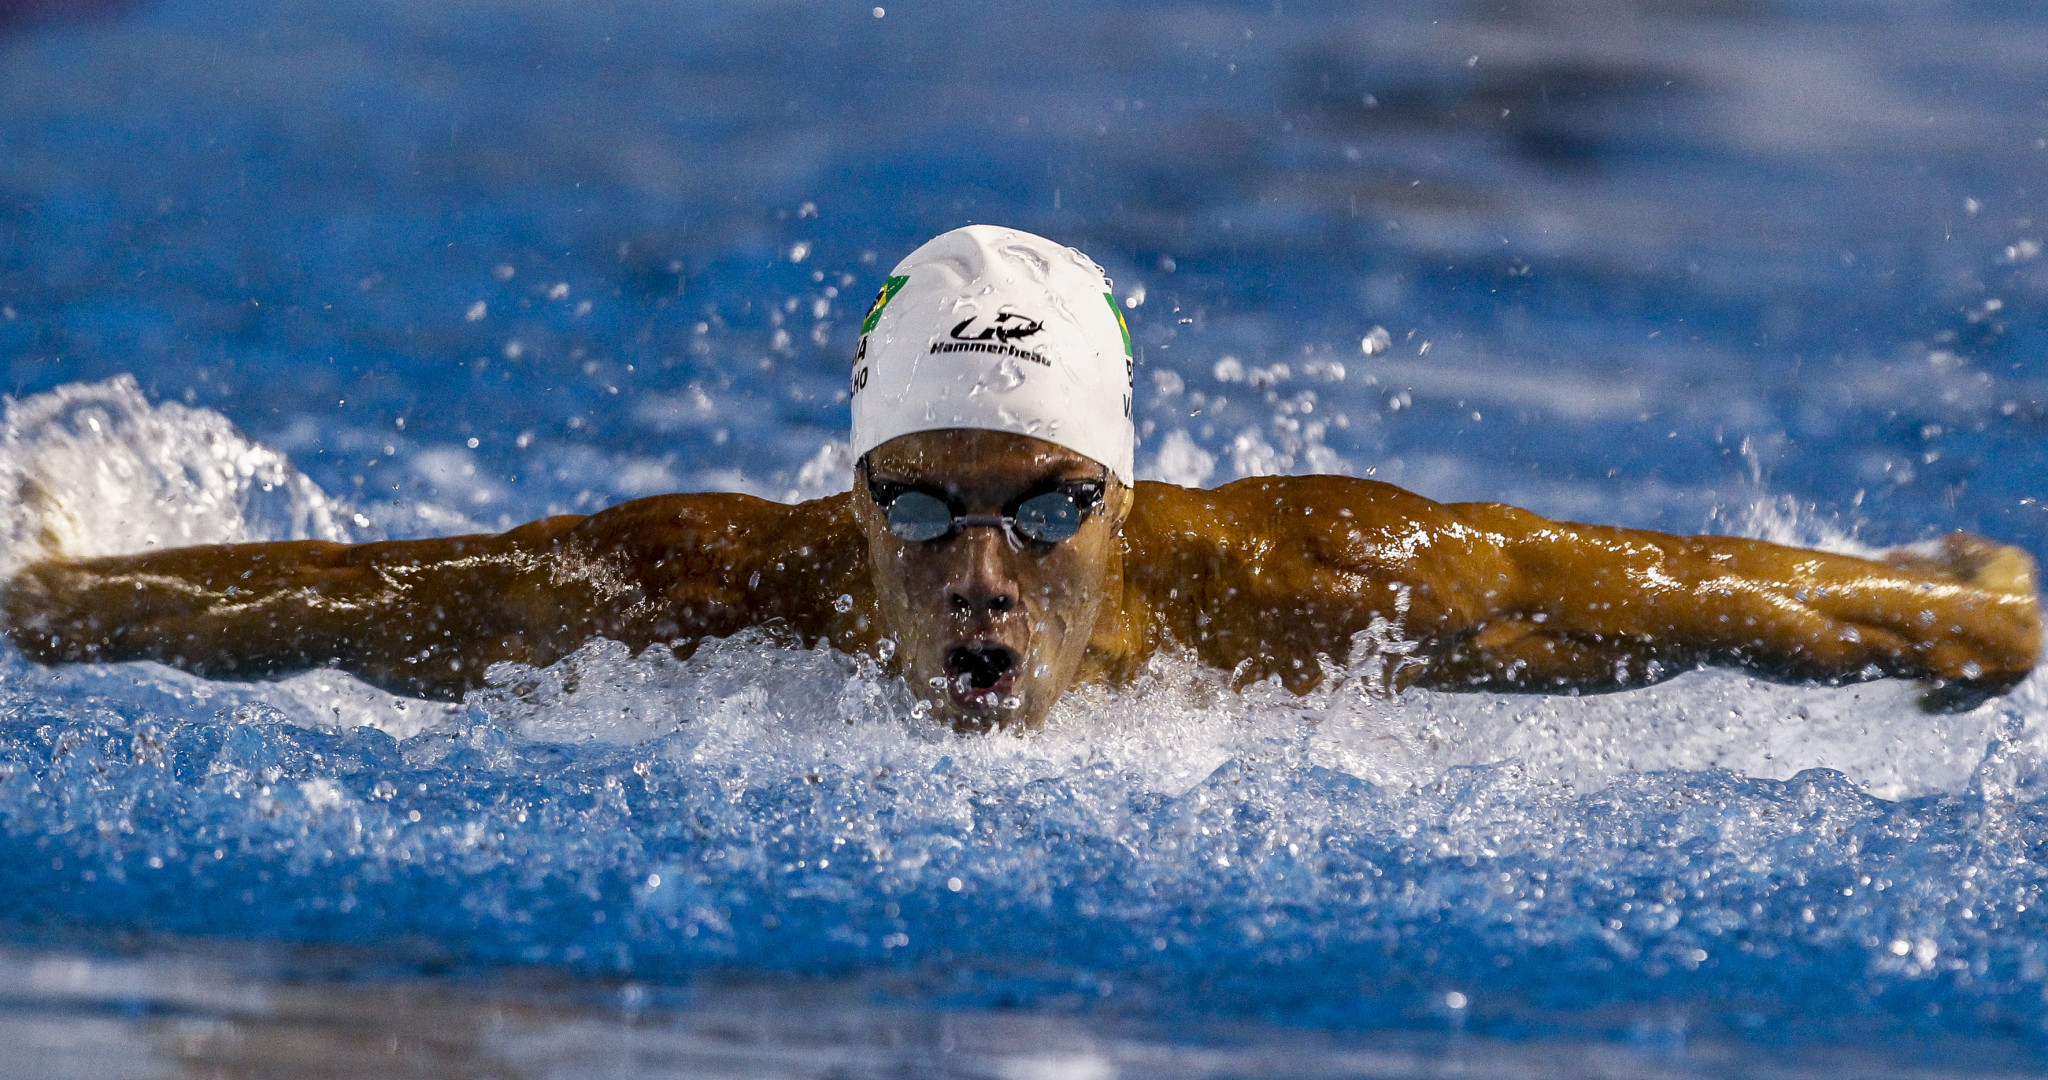 Brazil dominate final day of World Para Swimming World Series in São Paulo